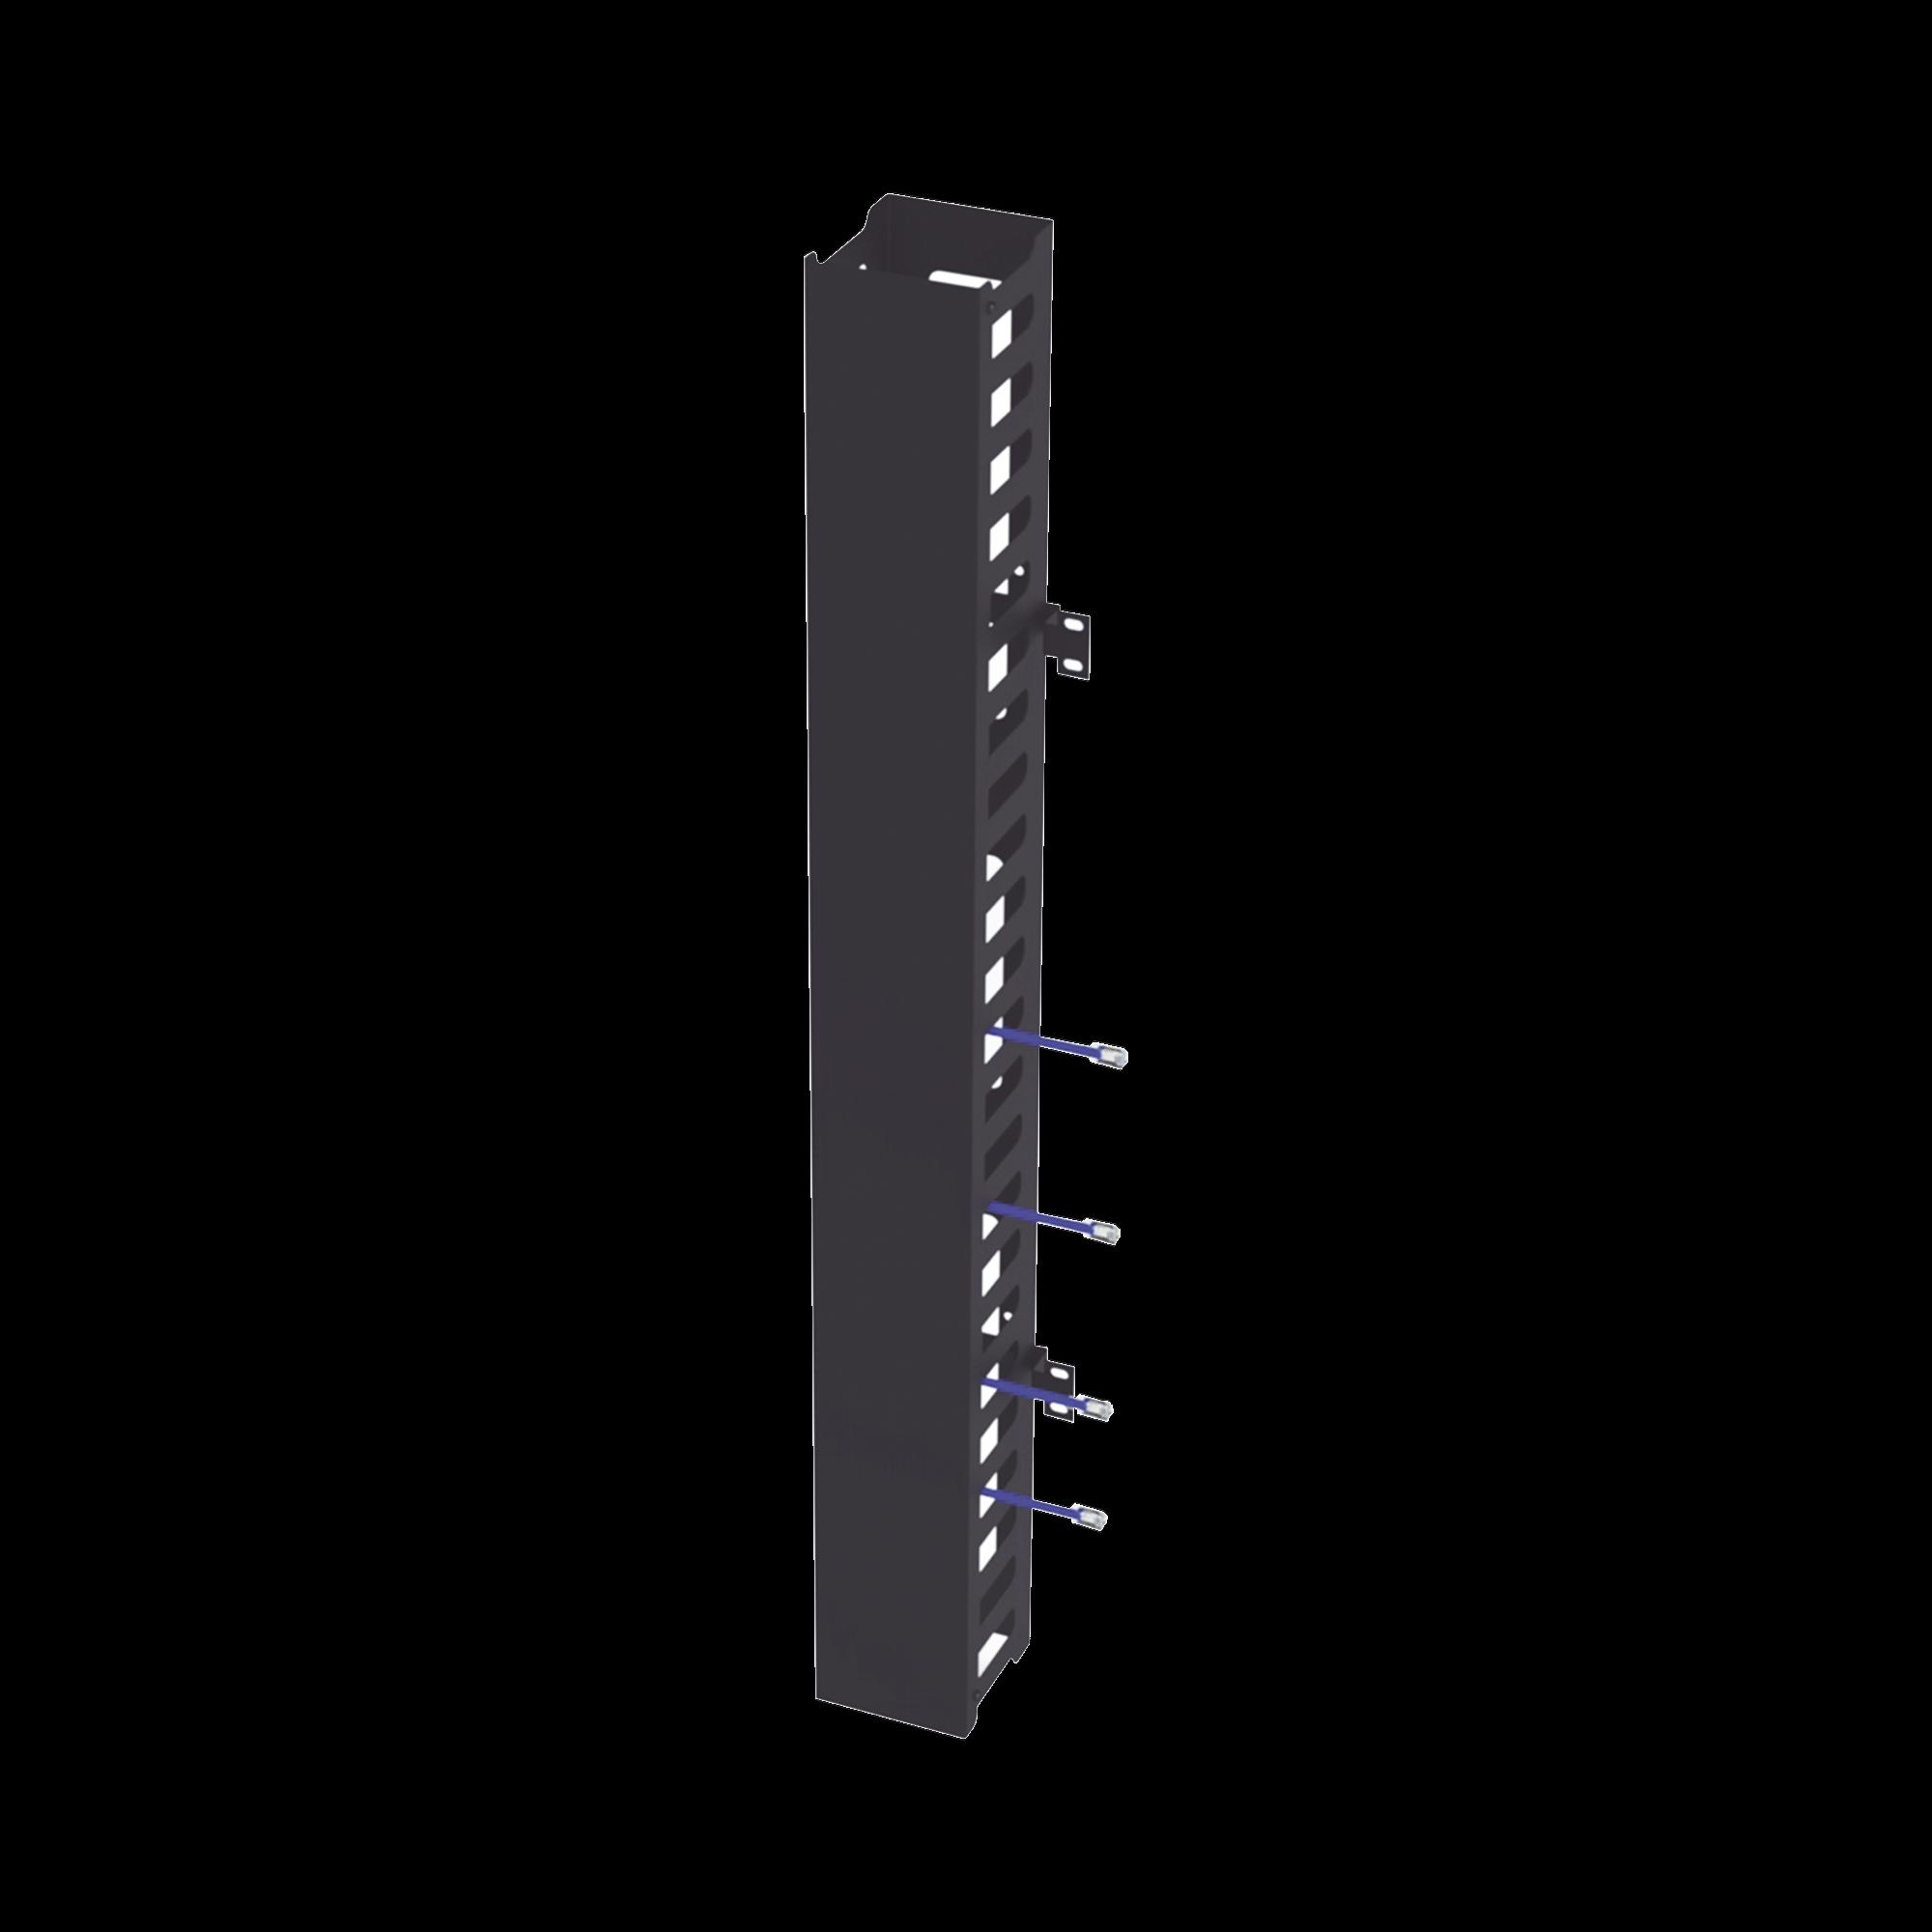 Kit Organizador Vertical de Cable Sencillo para Rack Abierto de 24 Unidades para EIQR3224 y EIRL5524DR.